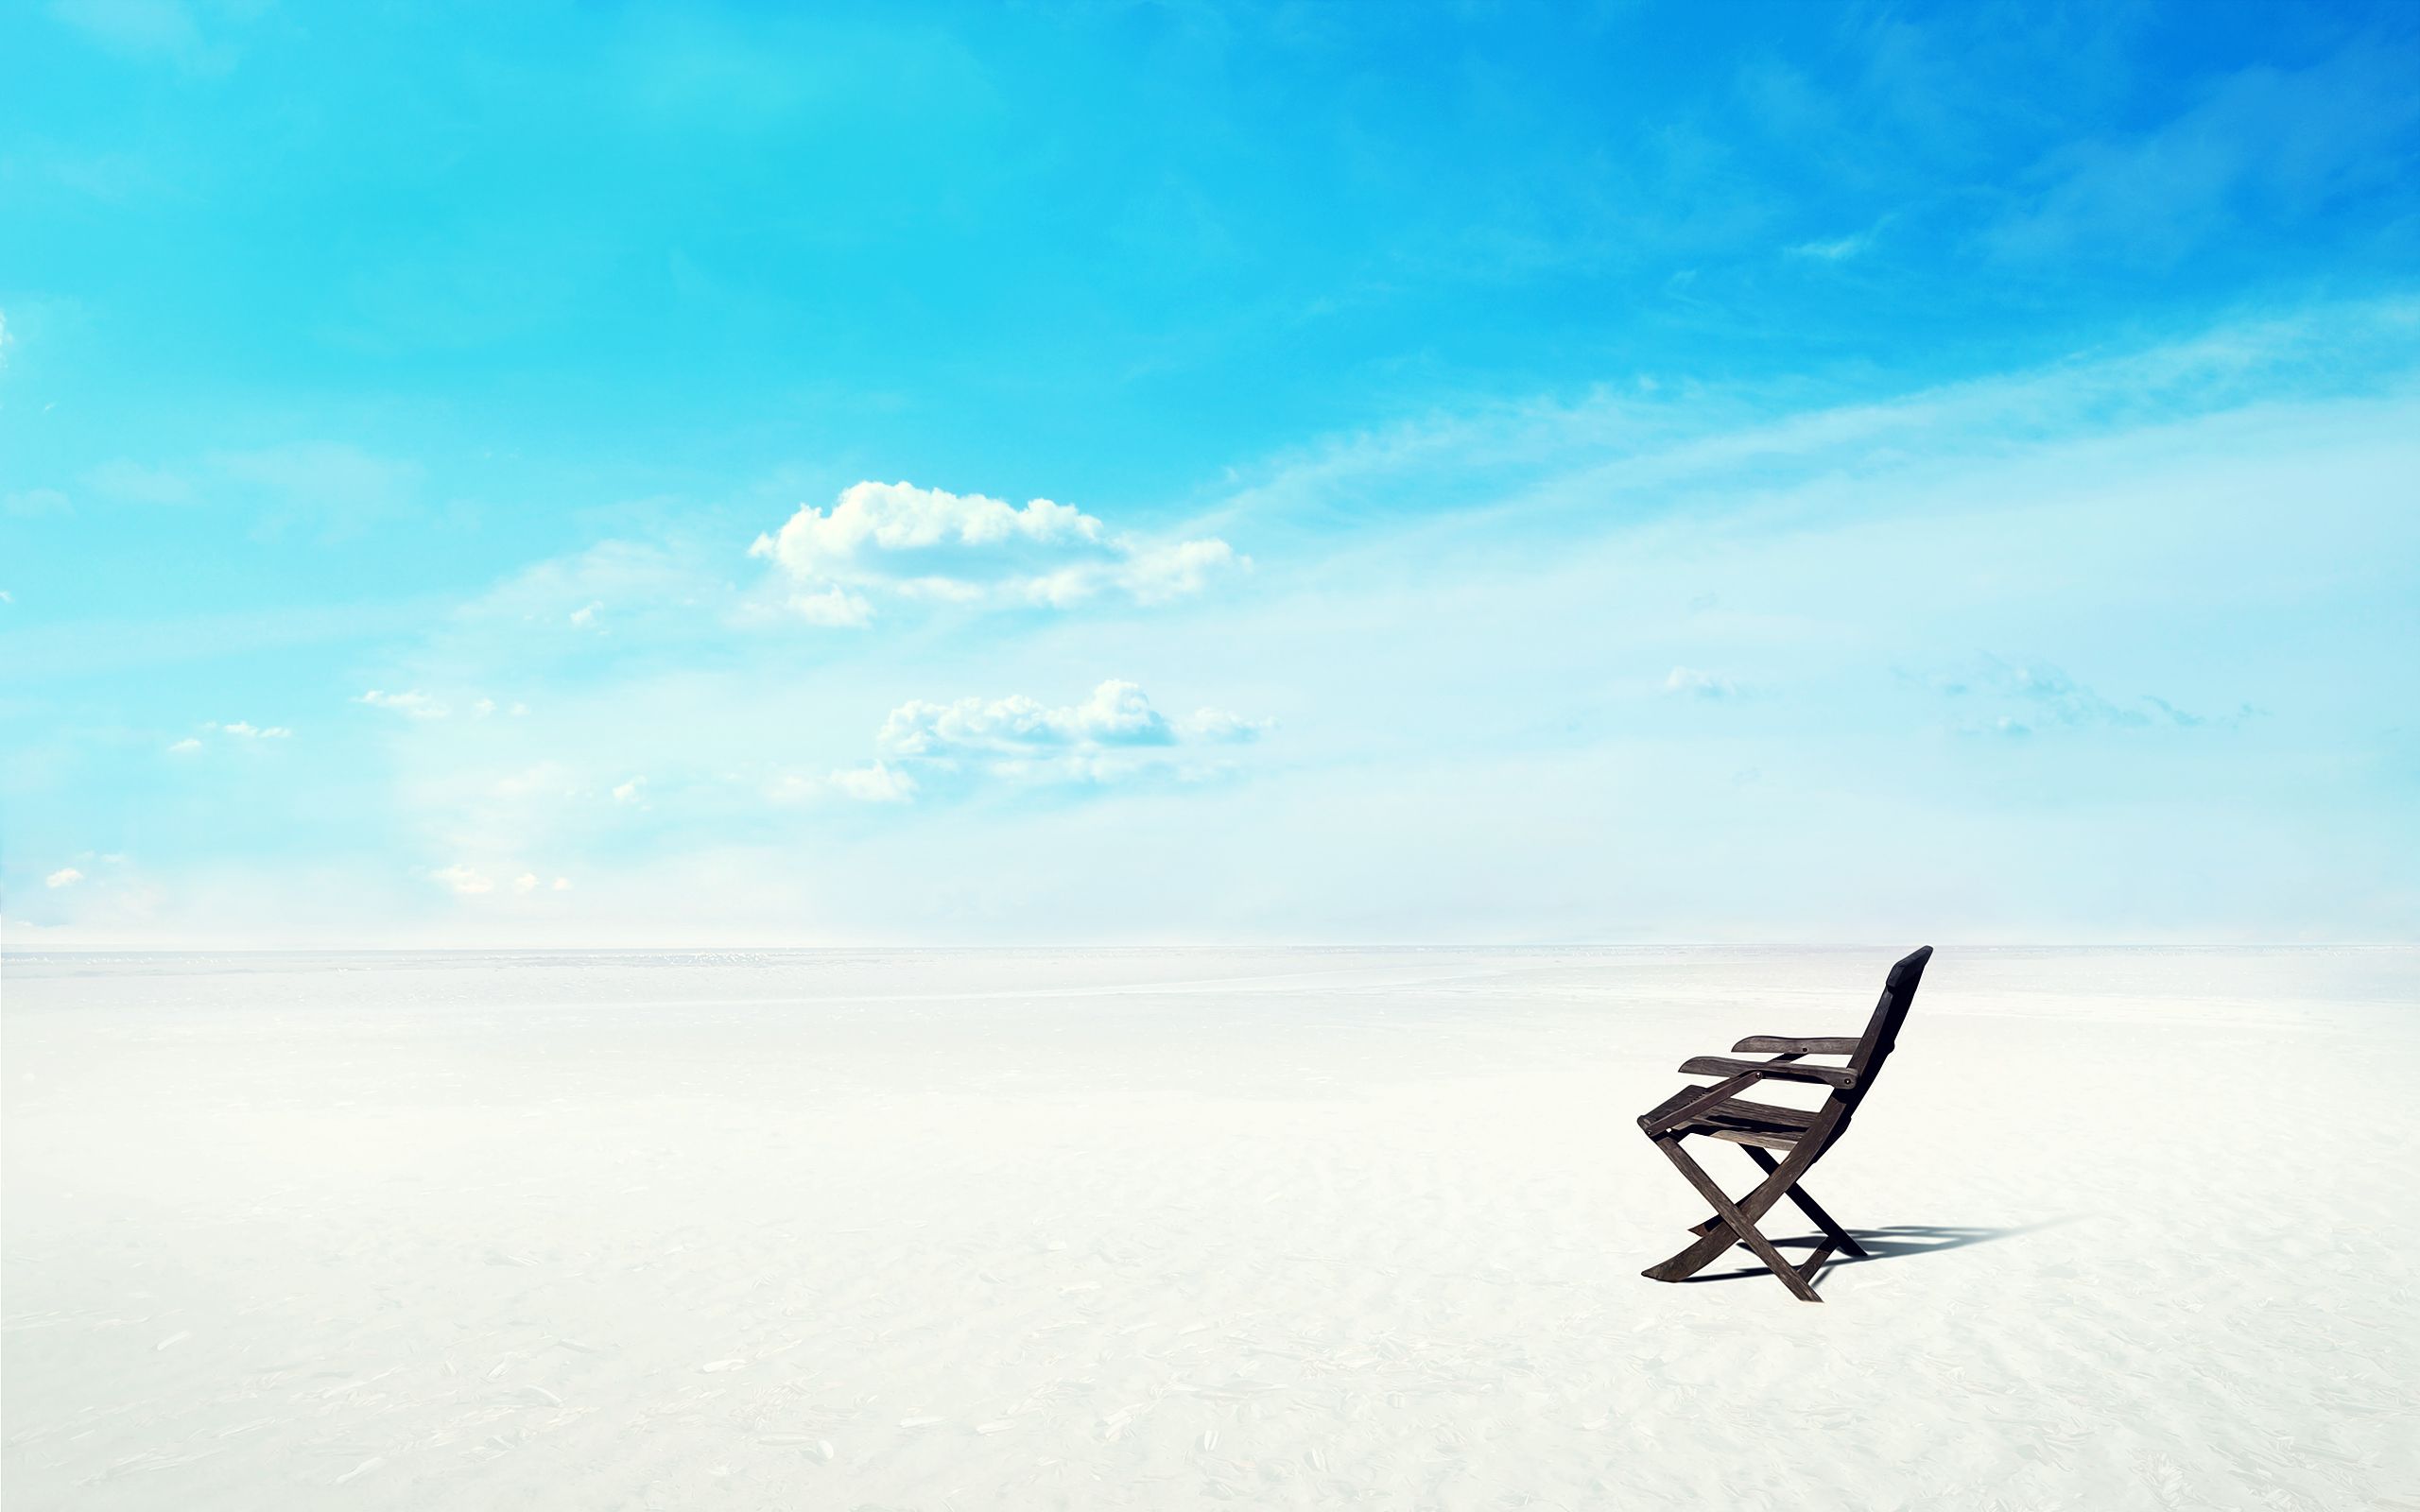 природа песок море горизонт небо облака  № 2577472 без смс